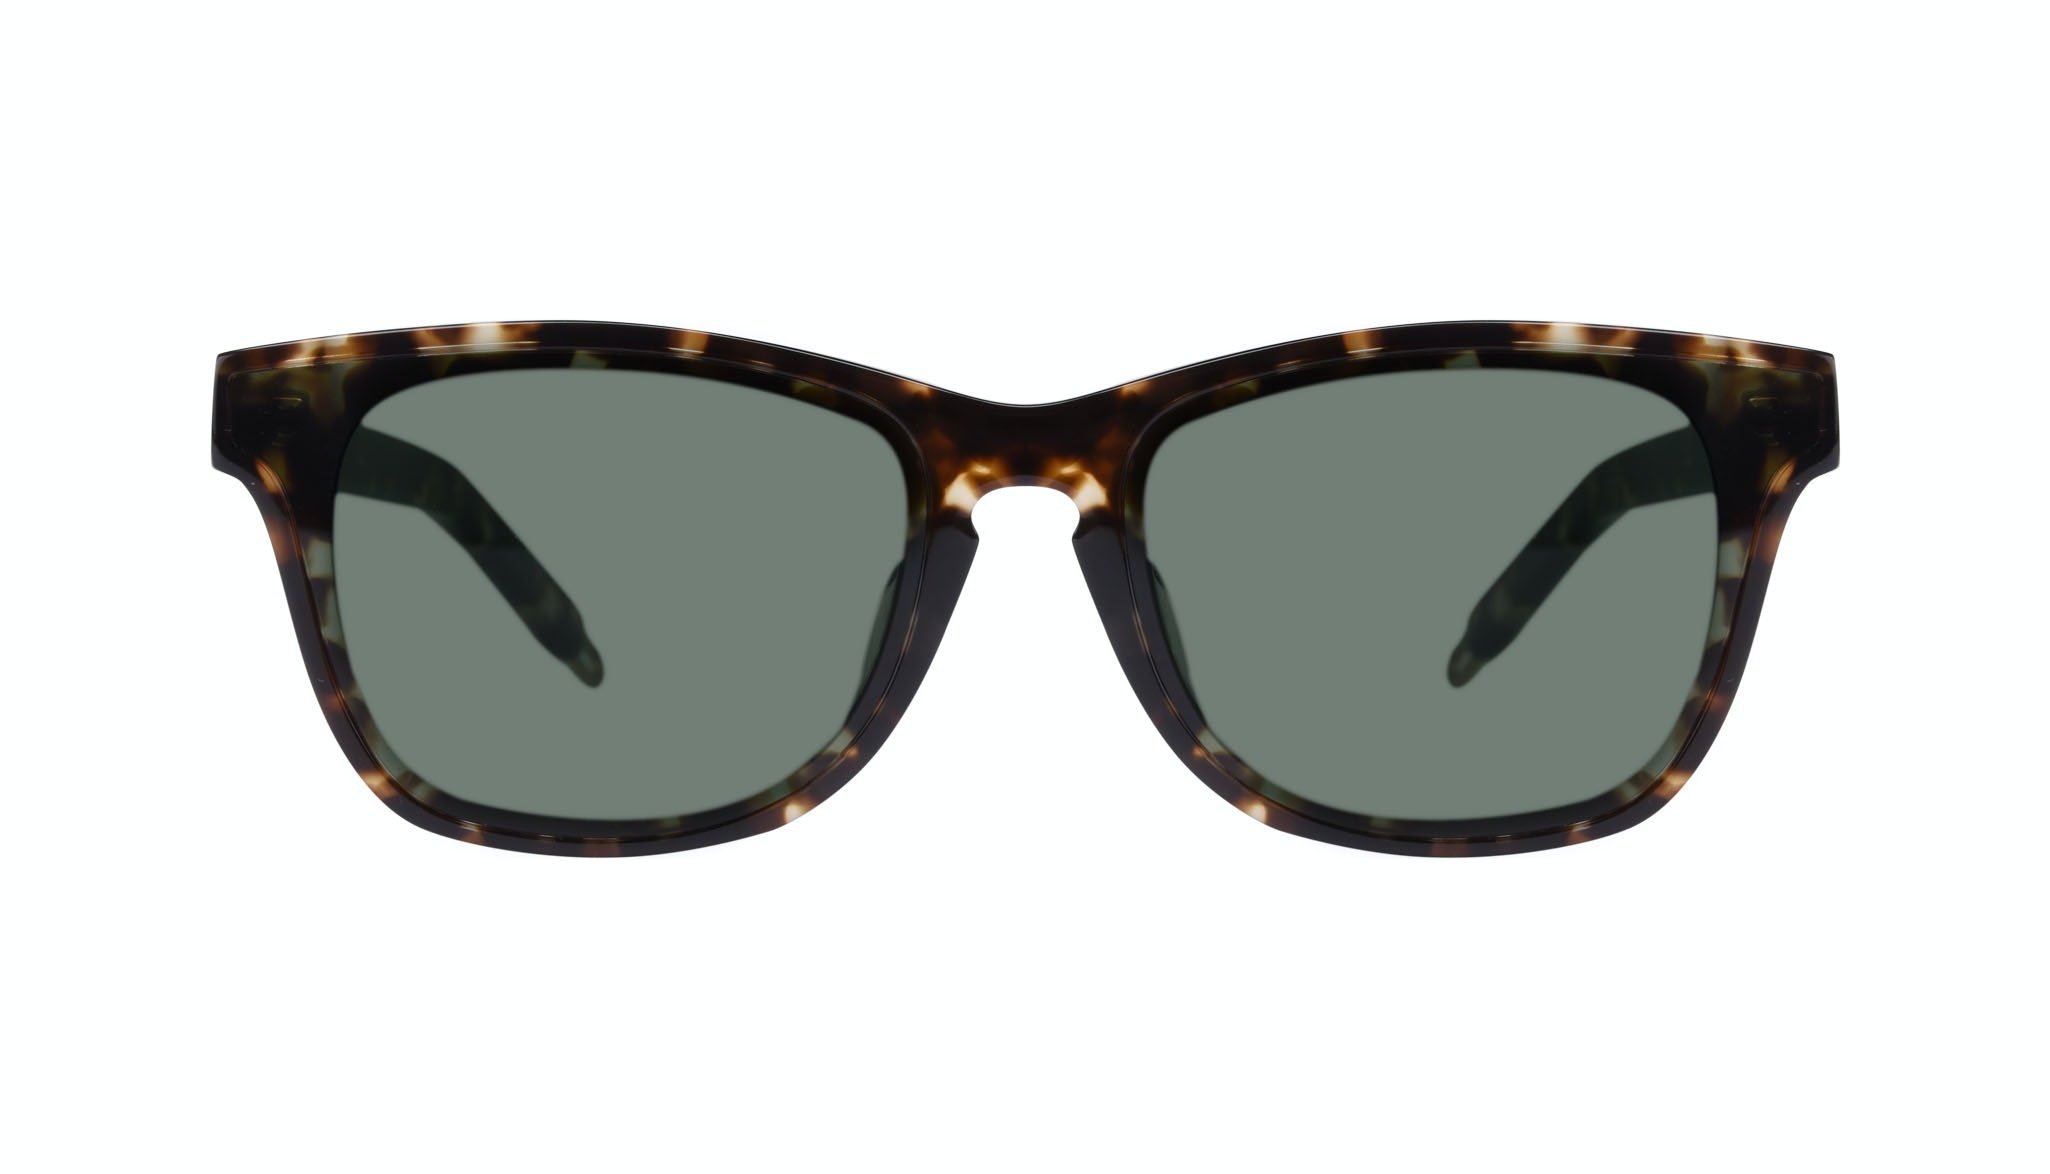 Affordable Fashion Glasses Square Sunglasses Men Commander Tortoise